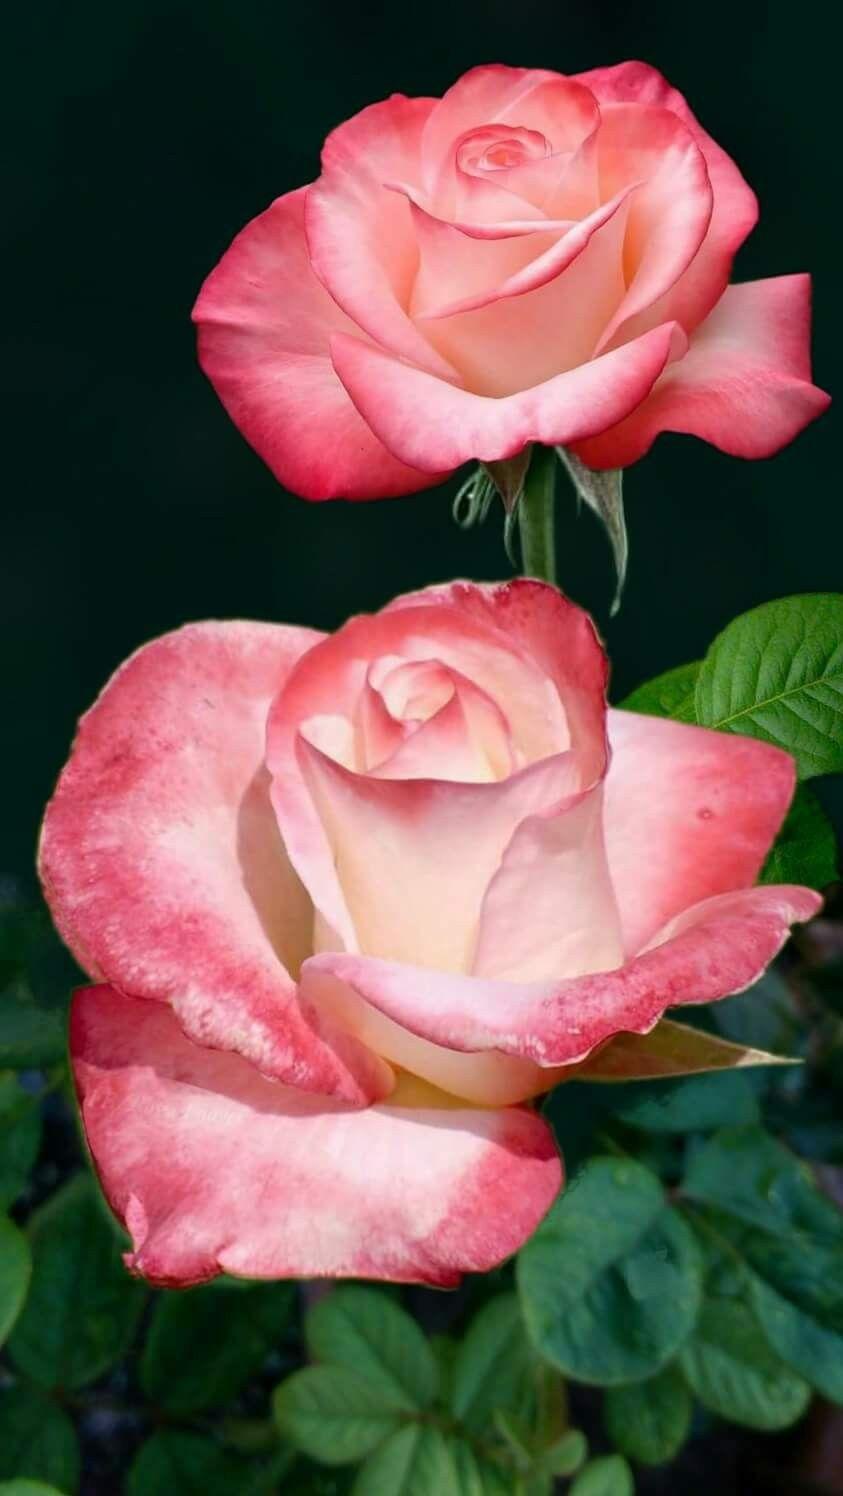 Pin By Cheryl Watkins On Flower Arrangements Rose Beautiful Roses Bibit Bunga Hibiscus Bicolor Striped Flowers